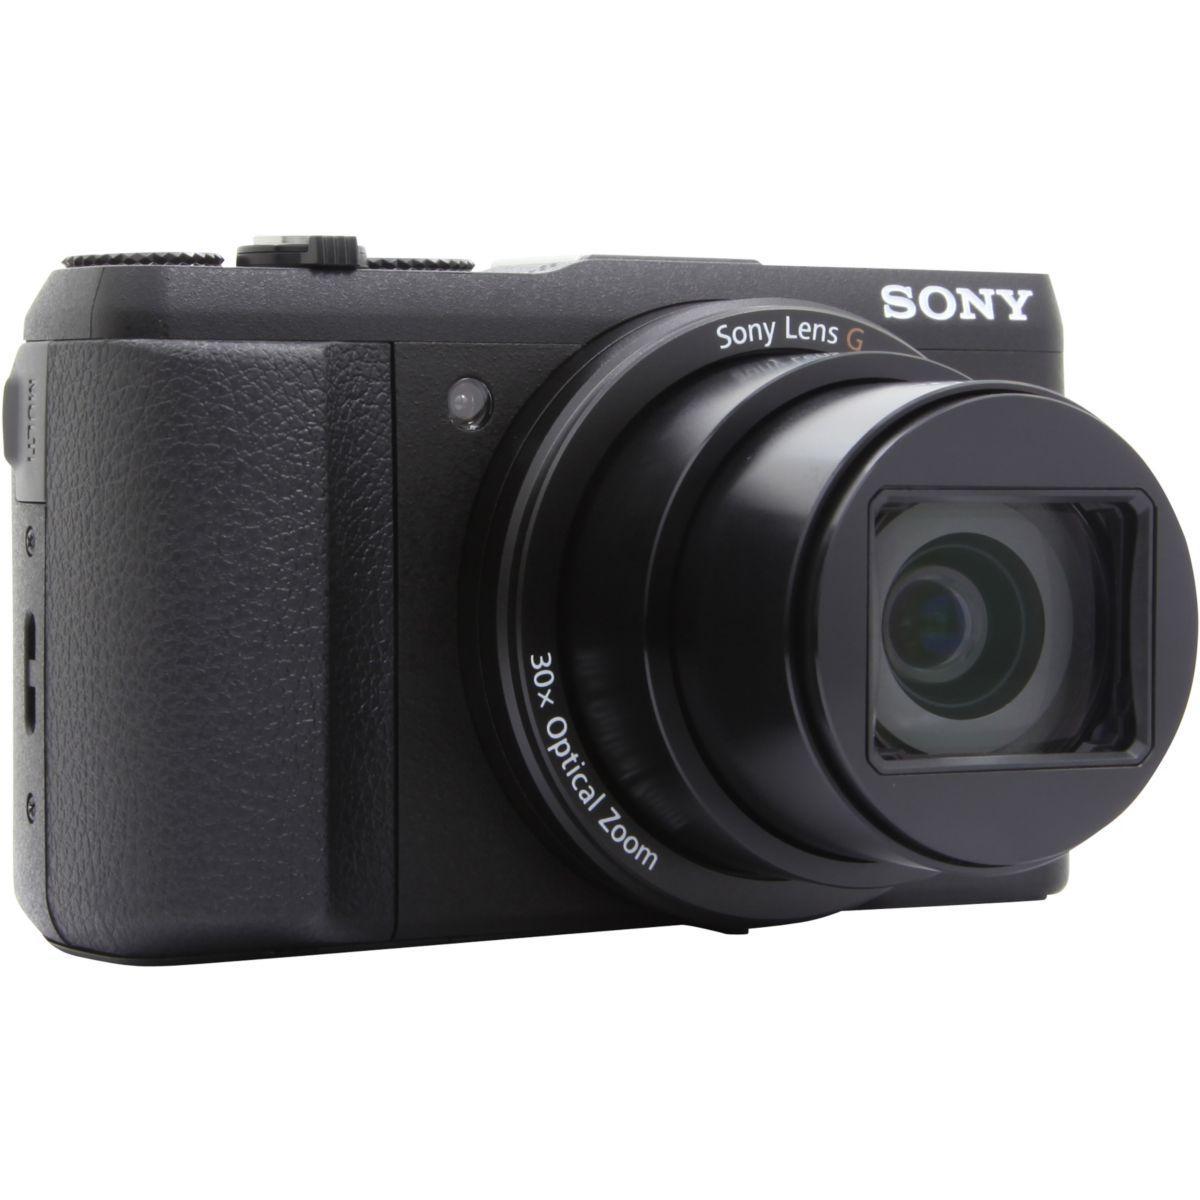 Appareil photo compact sony dsc-hx60 - livraison offerte : code livphoto (photo)